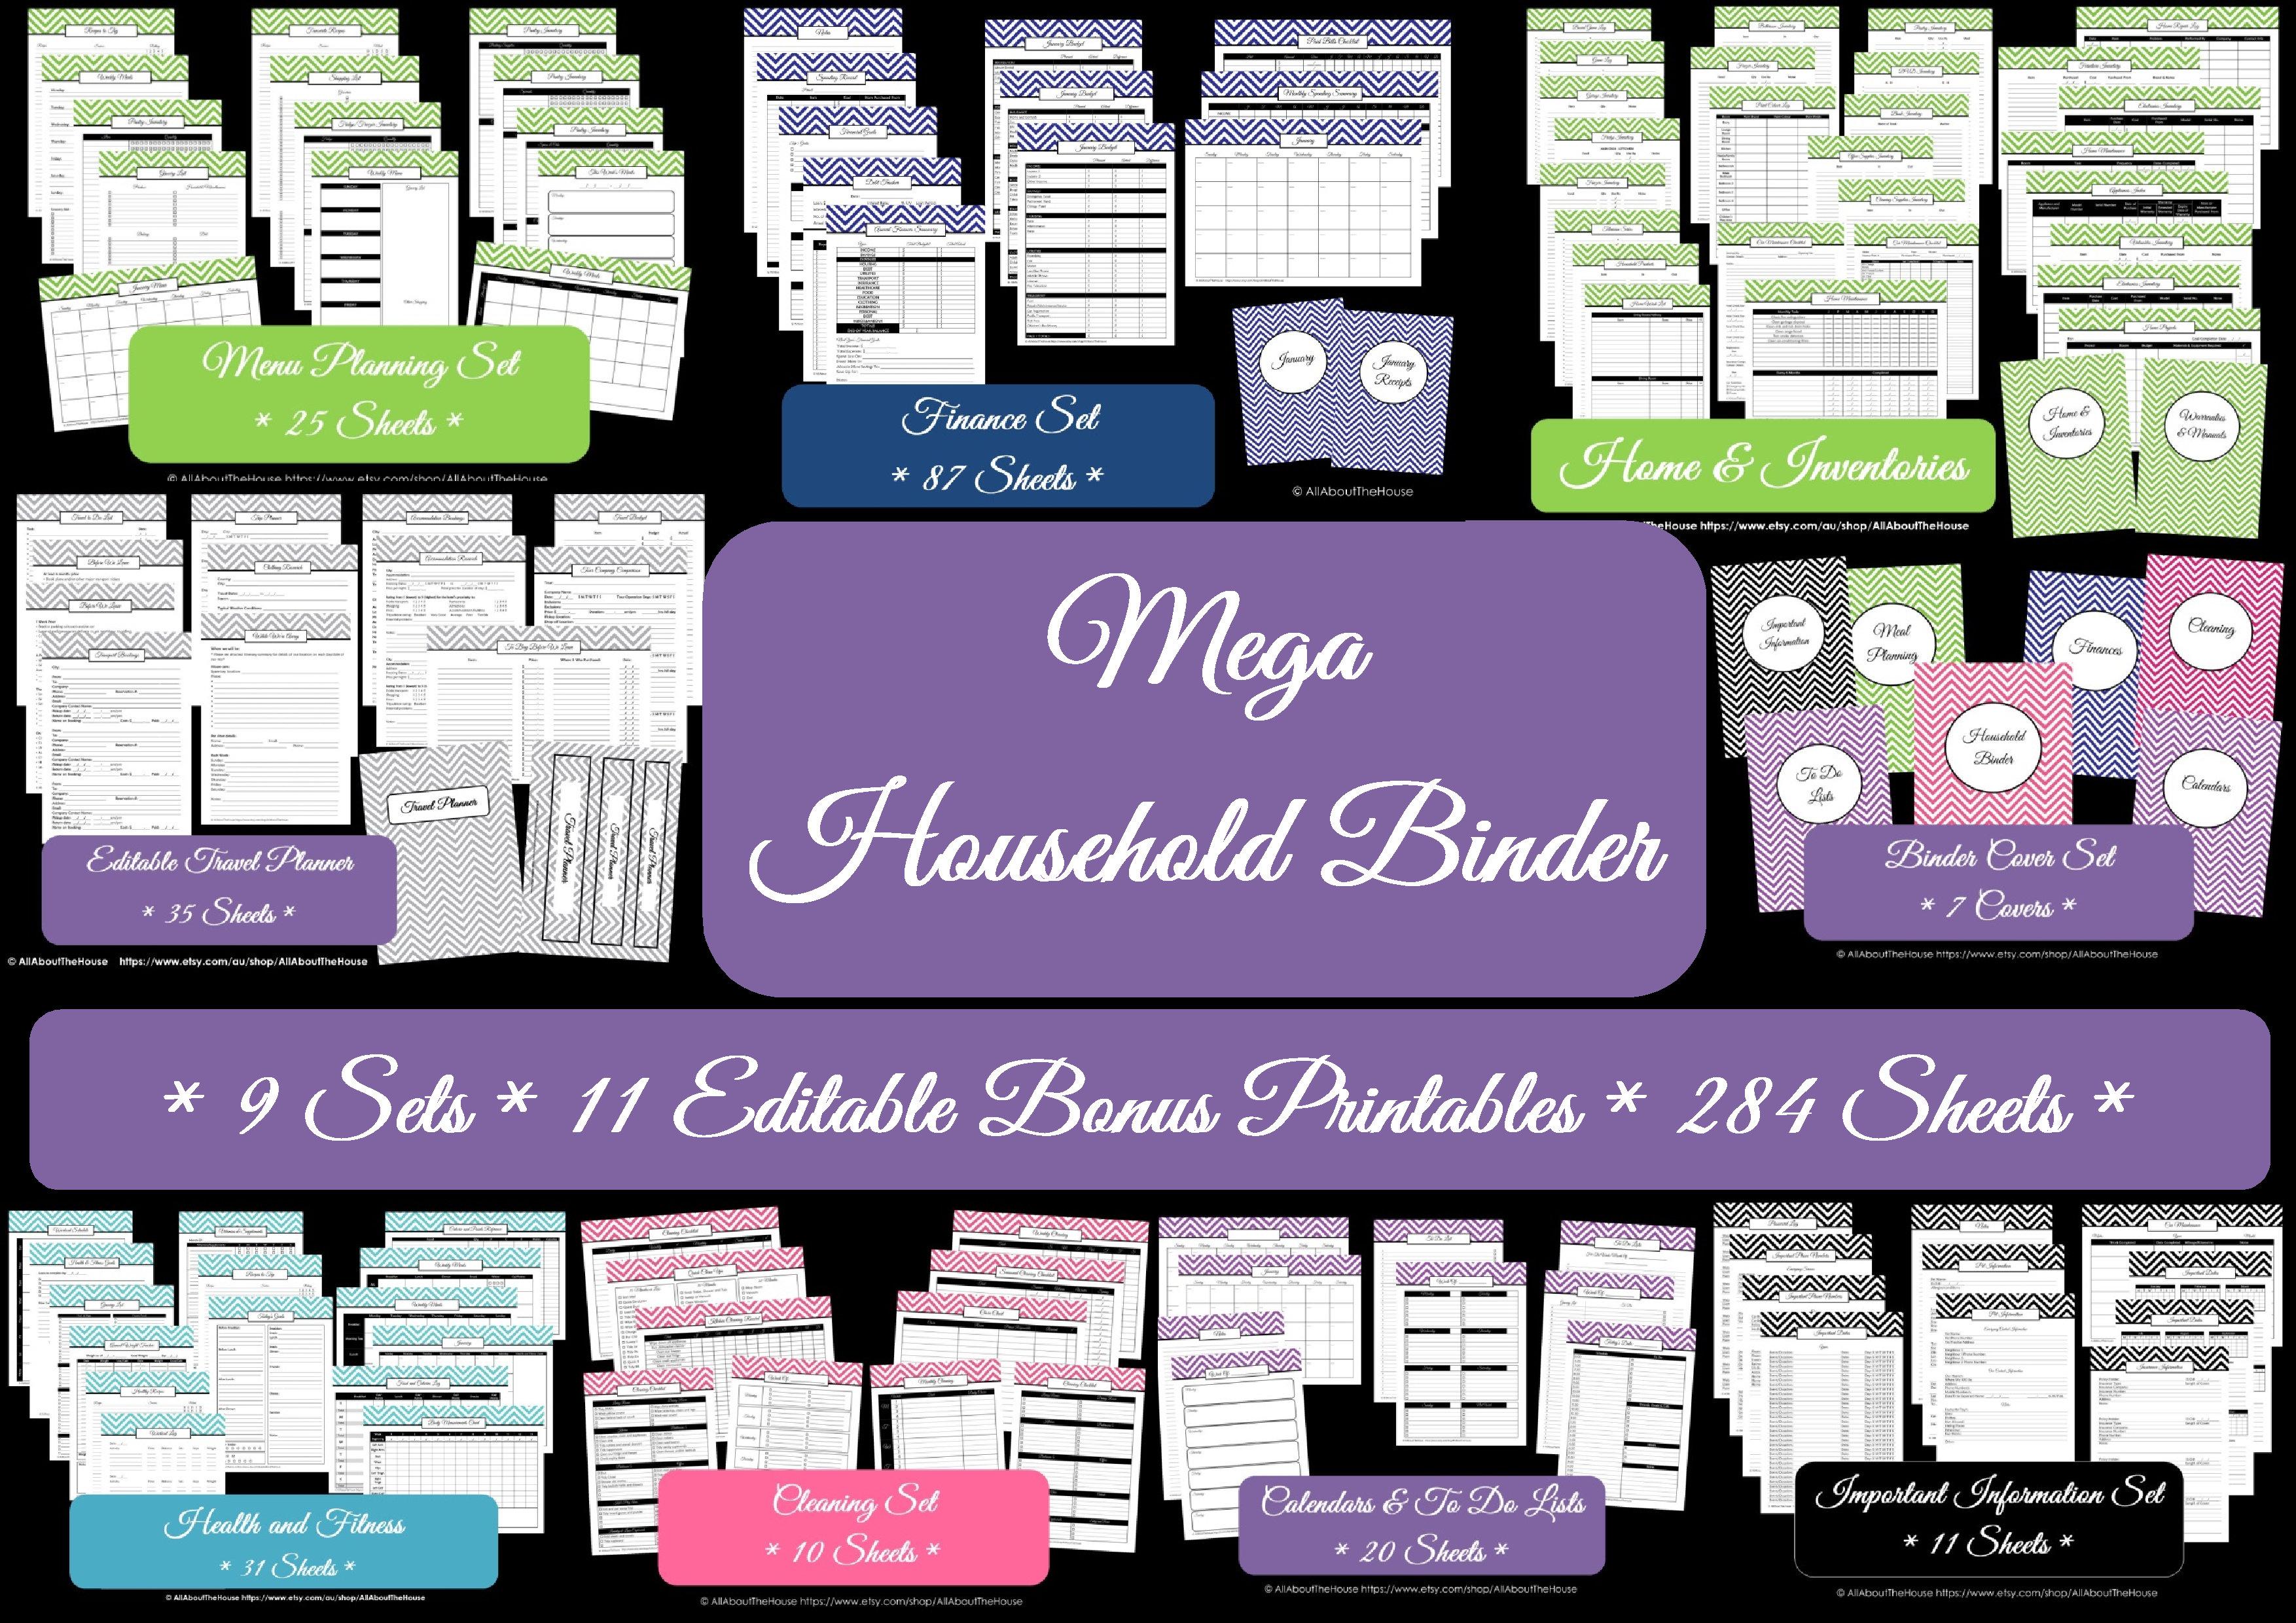 Mega Household Binder - AllAboutTheHouse